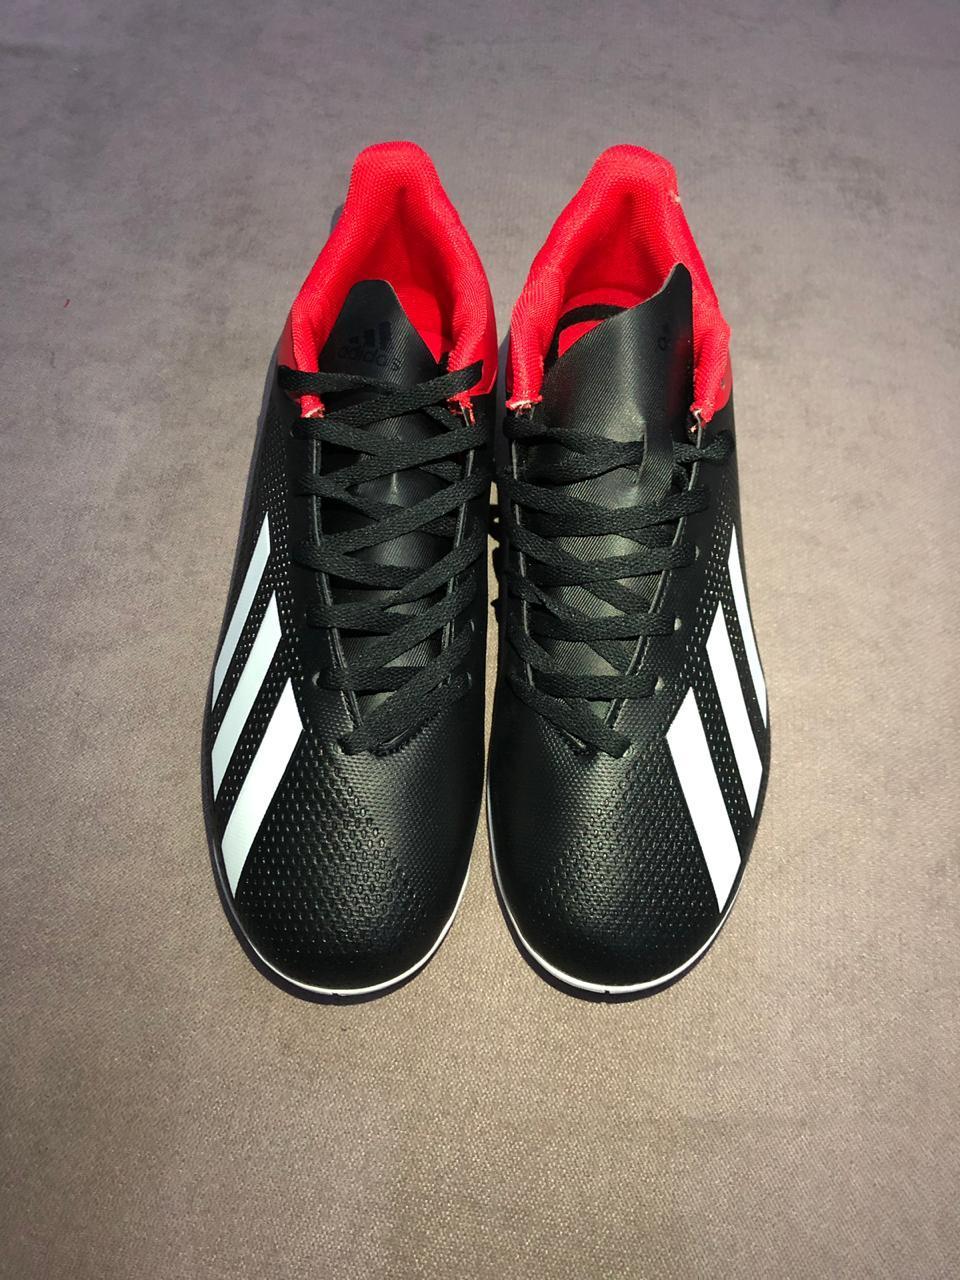 Футзалки Adidas X TANGO 18.4 IN - оригинал